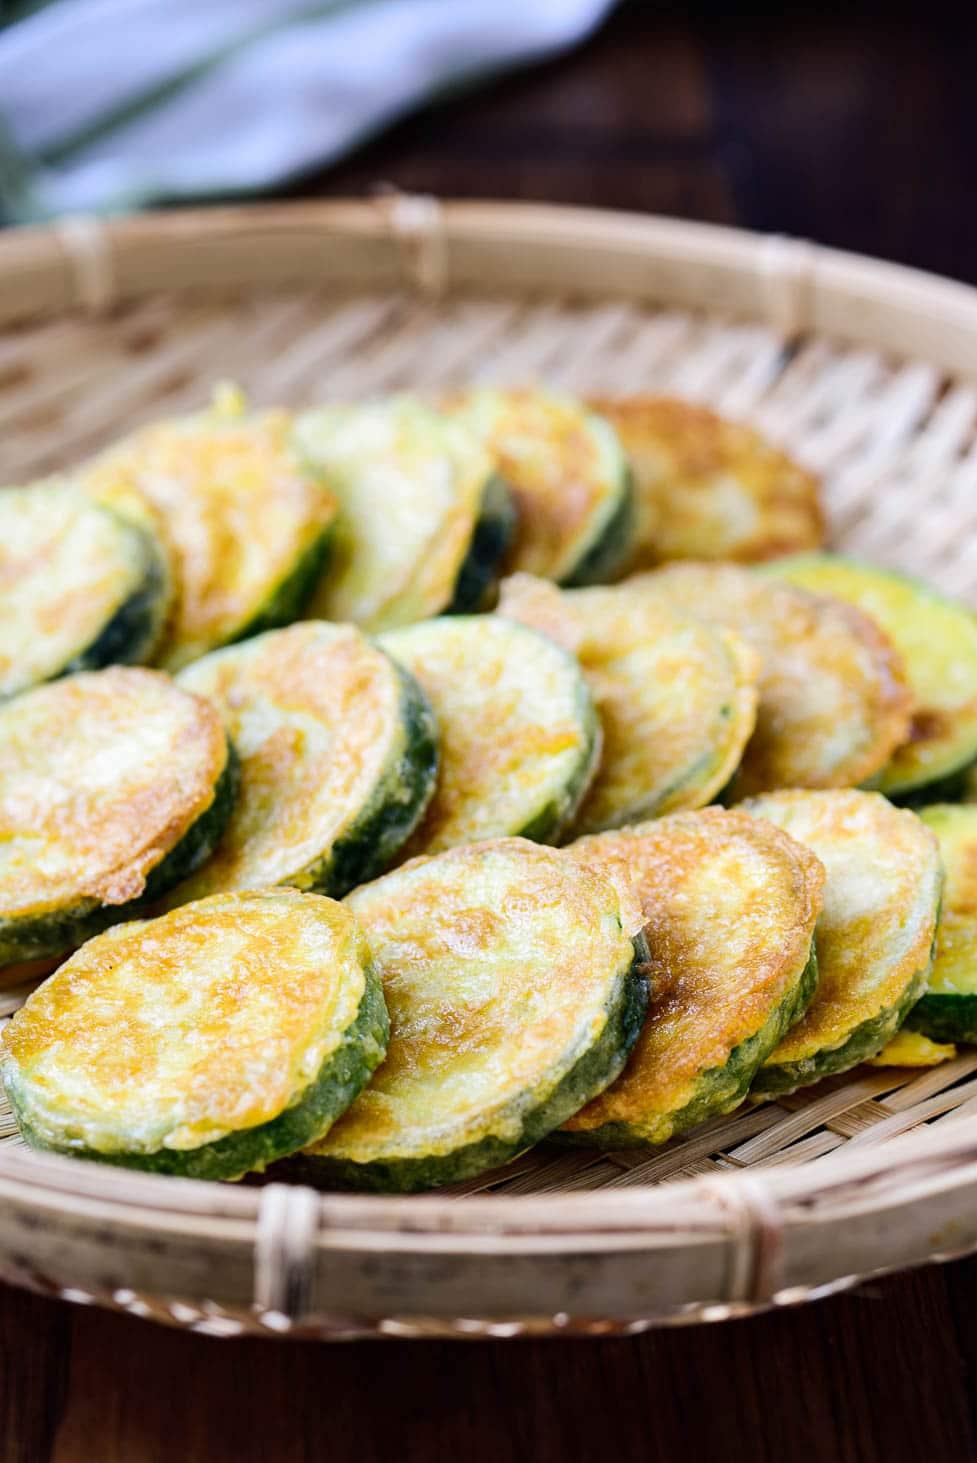 DSC3614 - Hobak Jeon (Pan-fried Zucchini in Egg Batter)